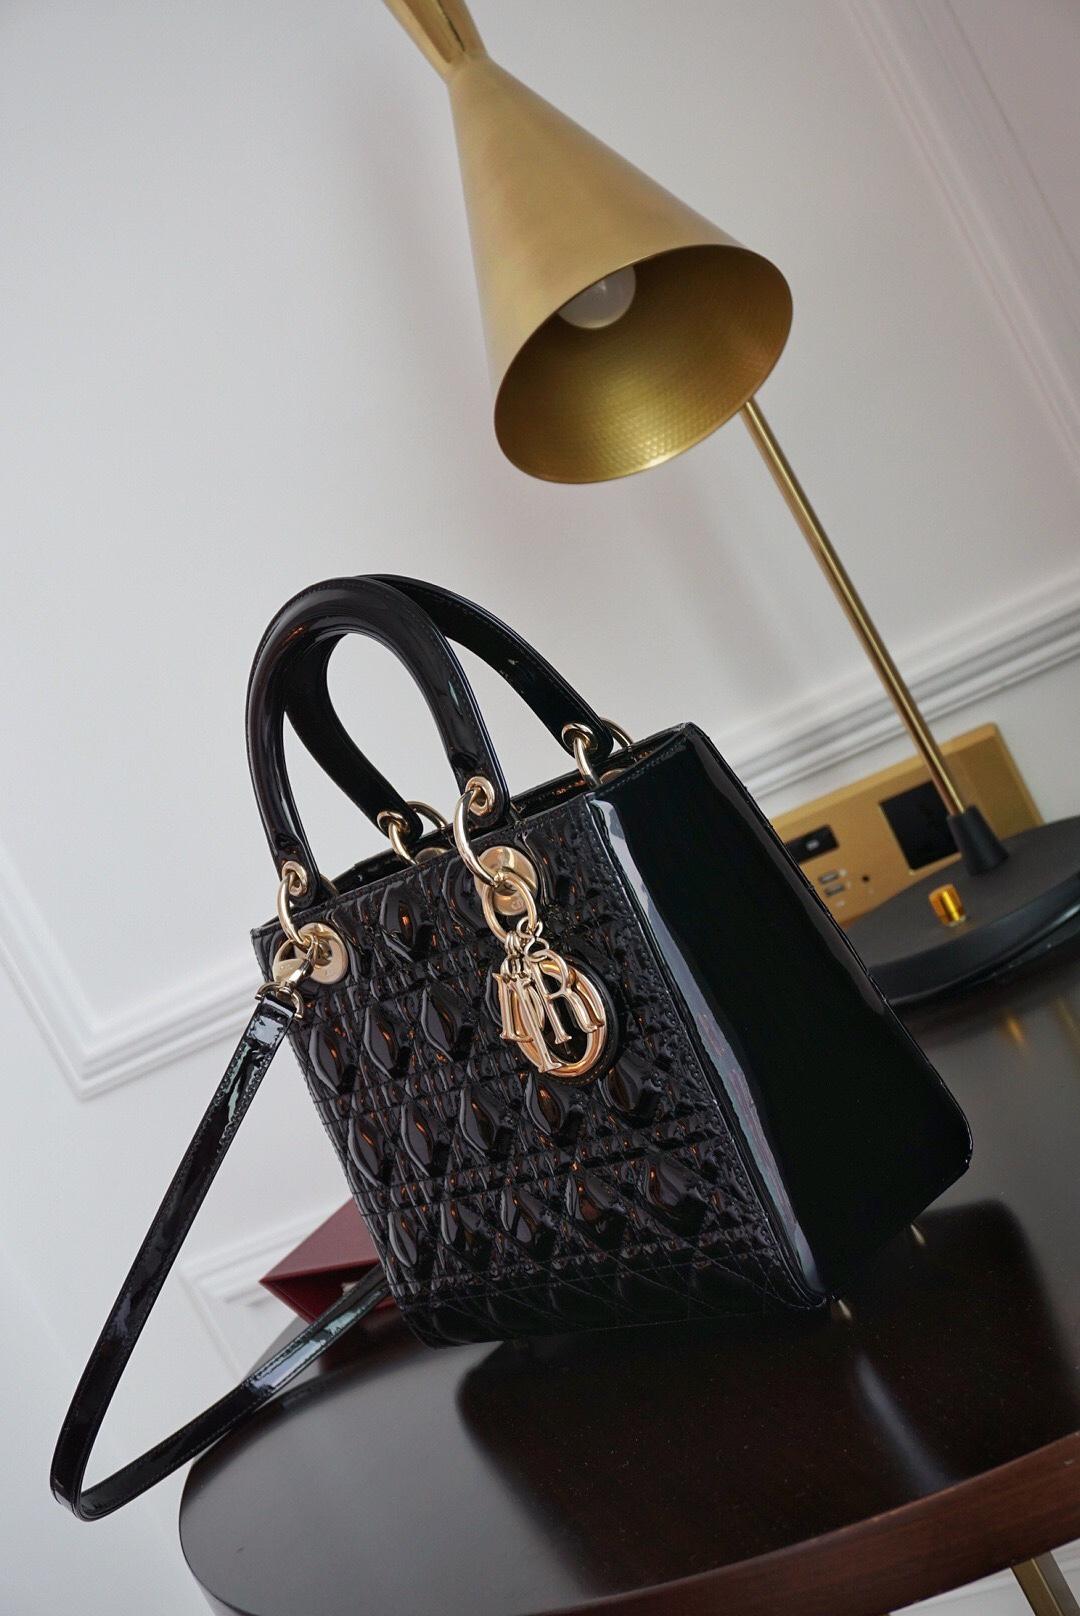 Dior 迪奥 戴妃包 Lady Dior 五格 24cm 黑色漆皮金扣  日常正式场合都能Hold住